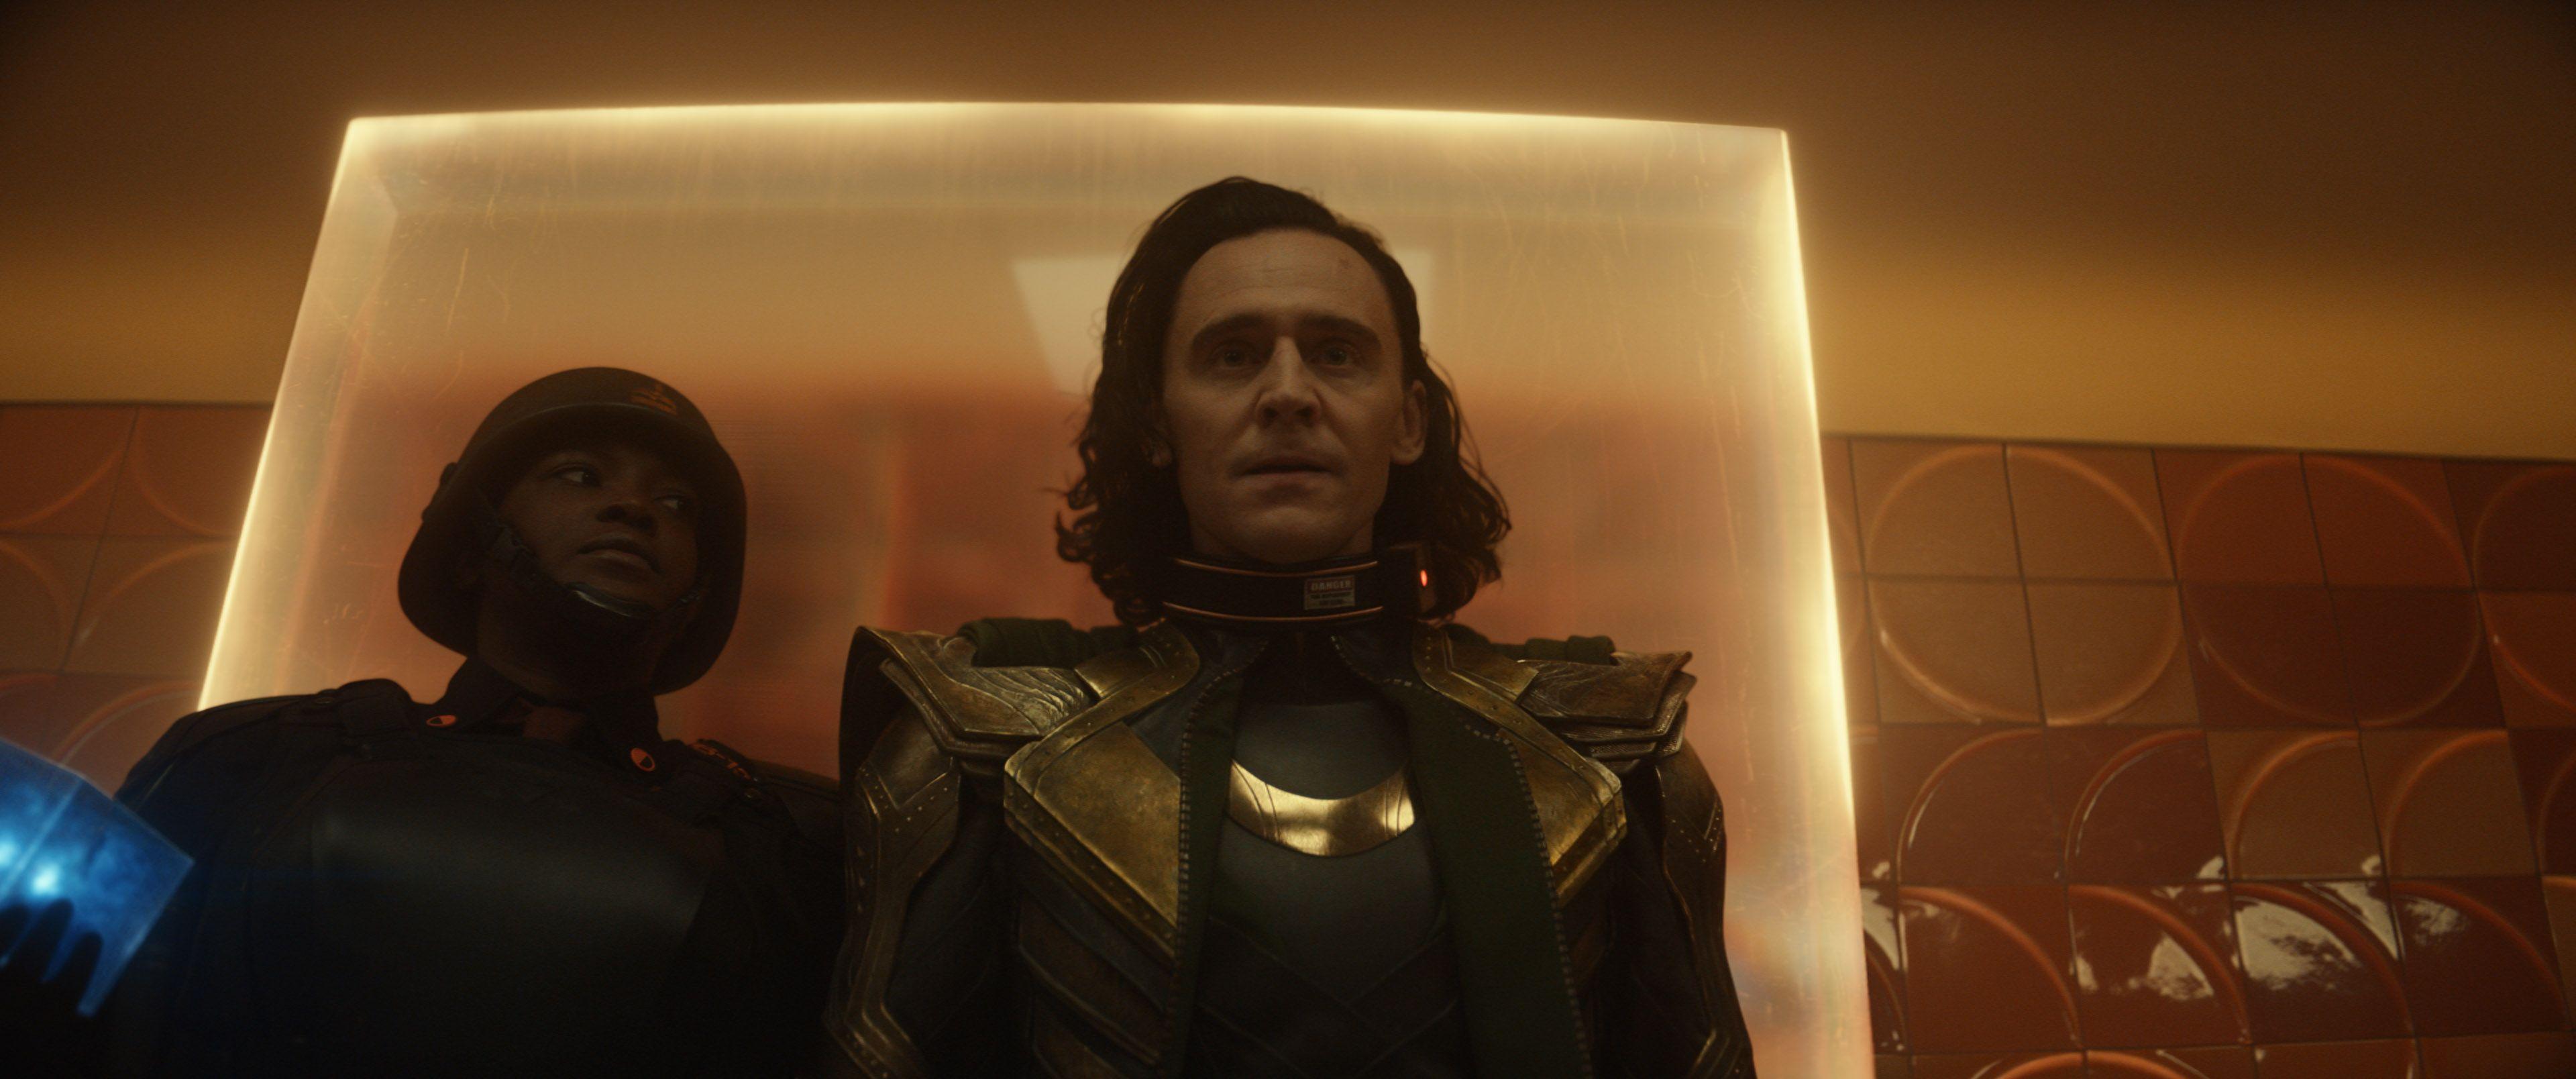 Loki recensione serie TV Disney+ primo episodio Gloriosi propositi Tom Hiddleston